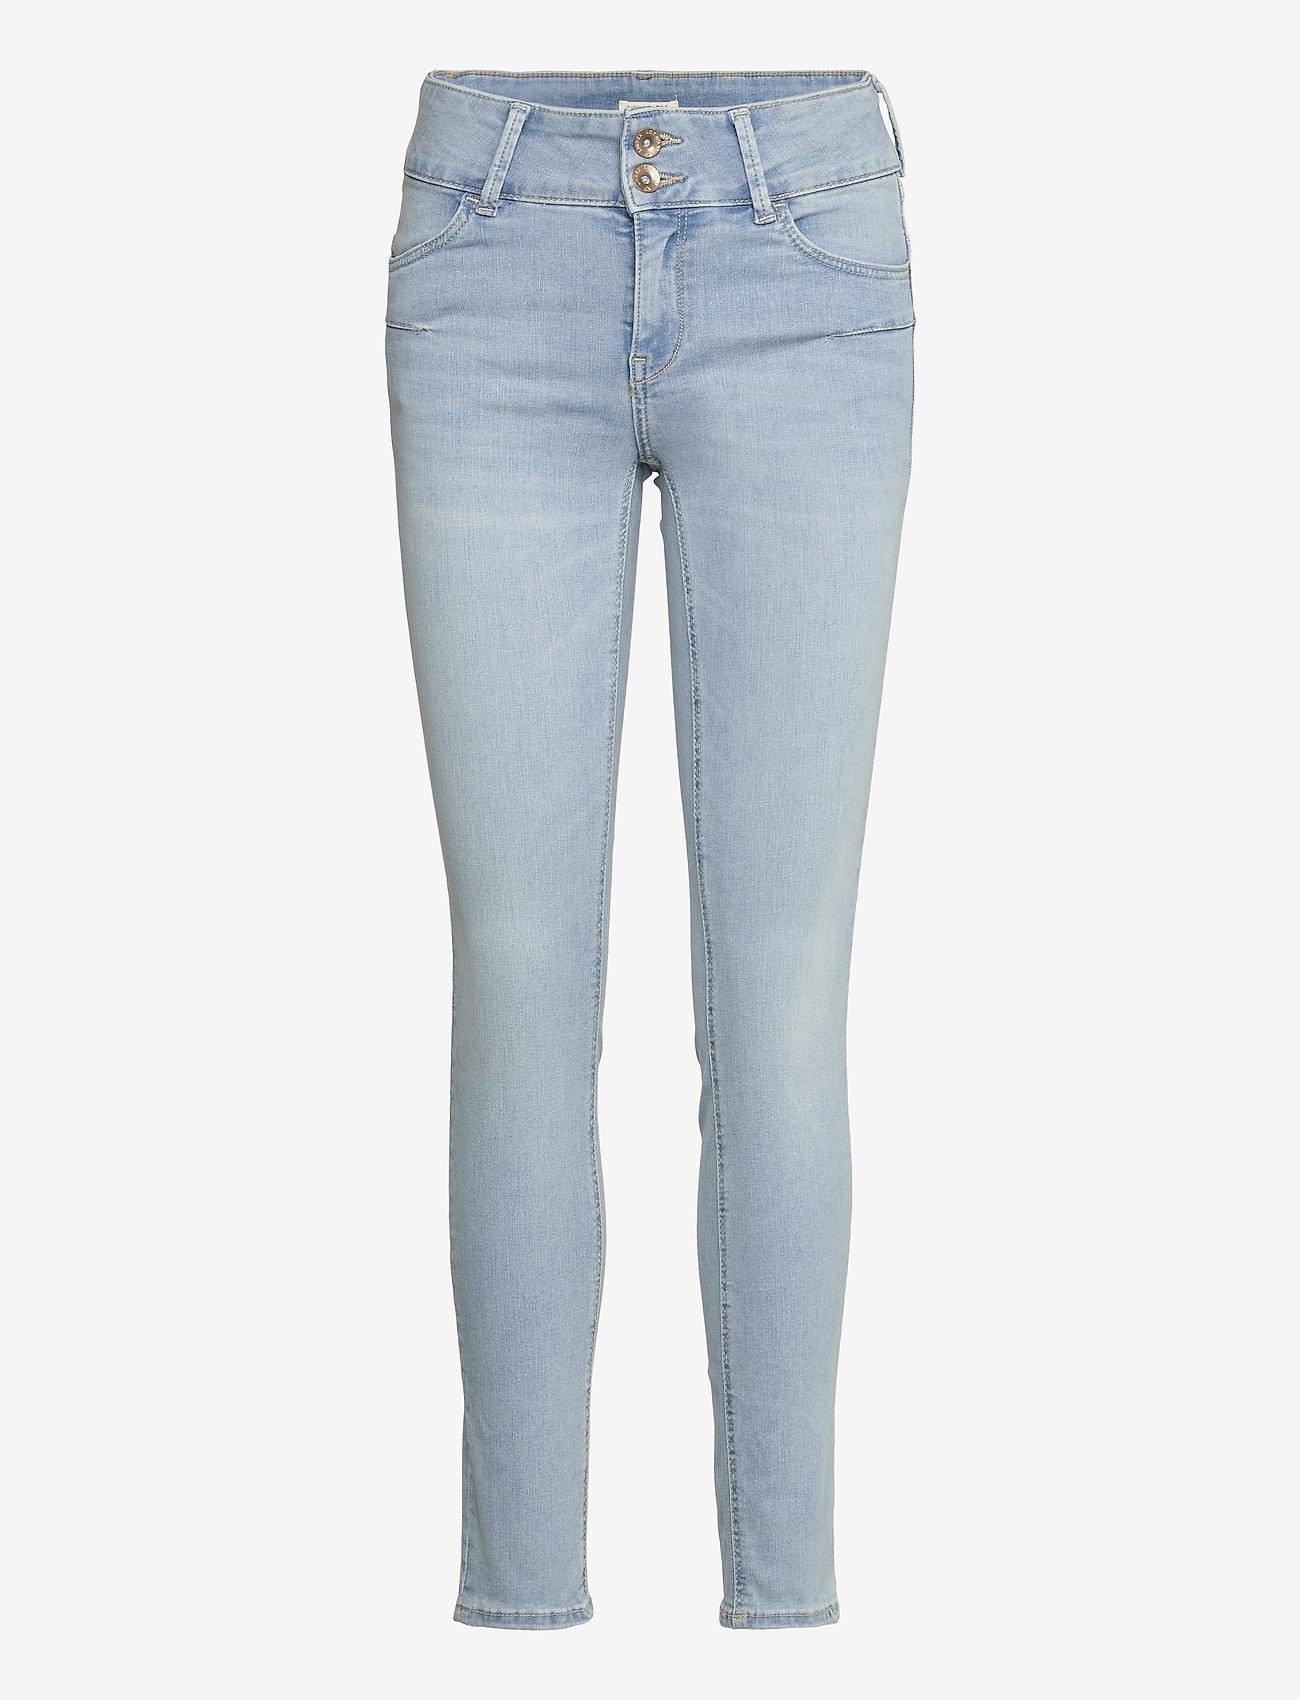 Lindex - Trousers denim Lilly lt blue - skinny jeans - blue - 0